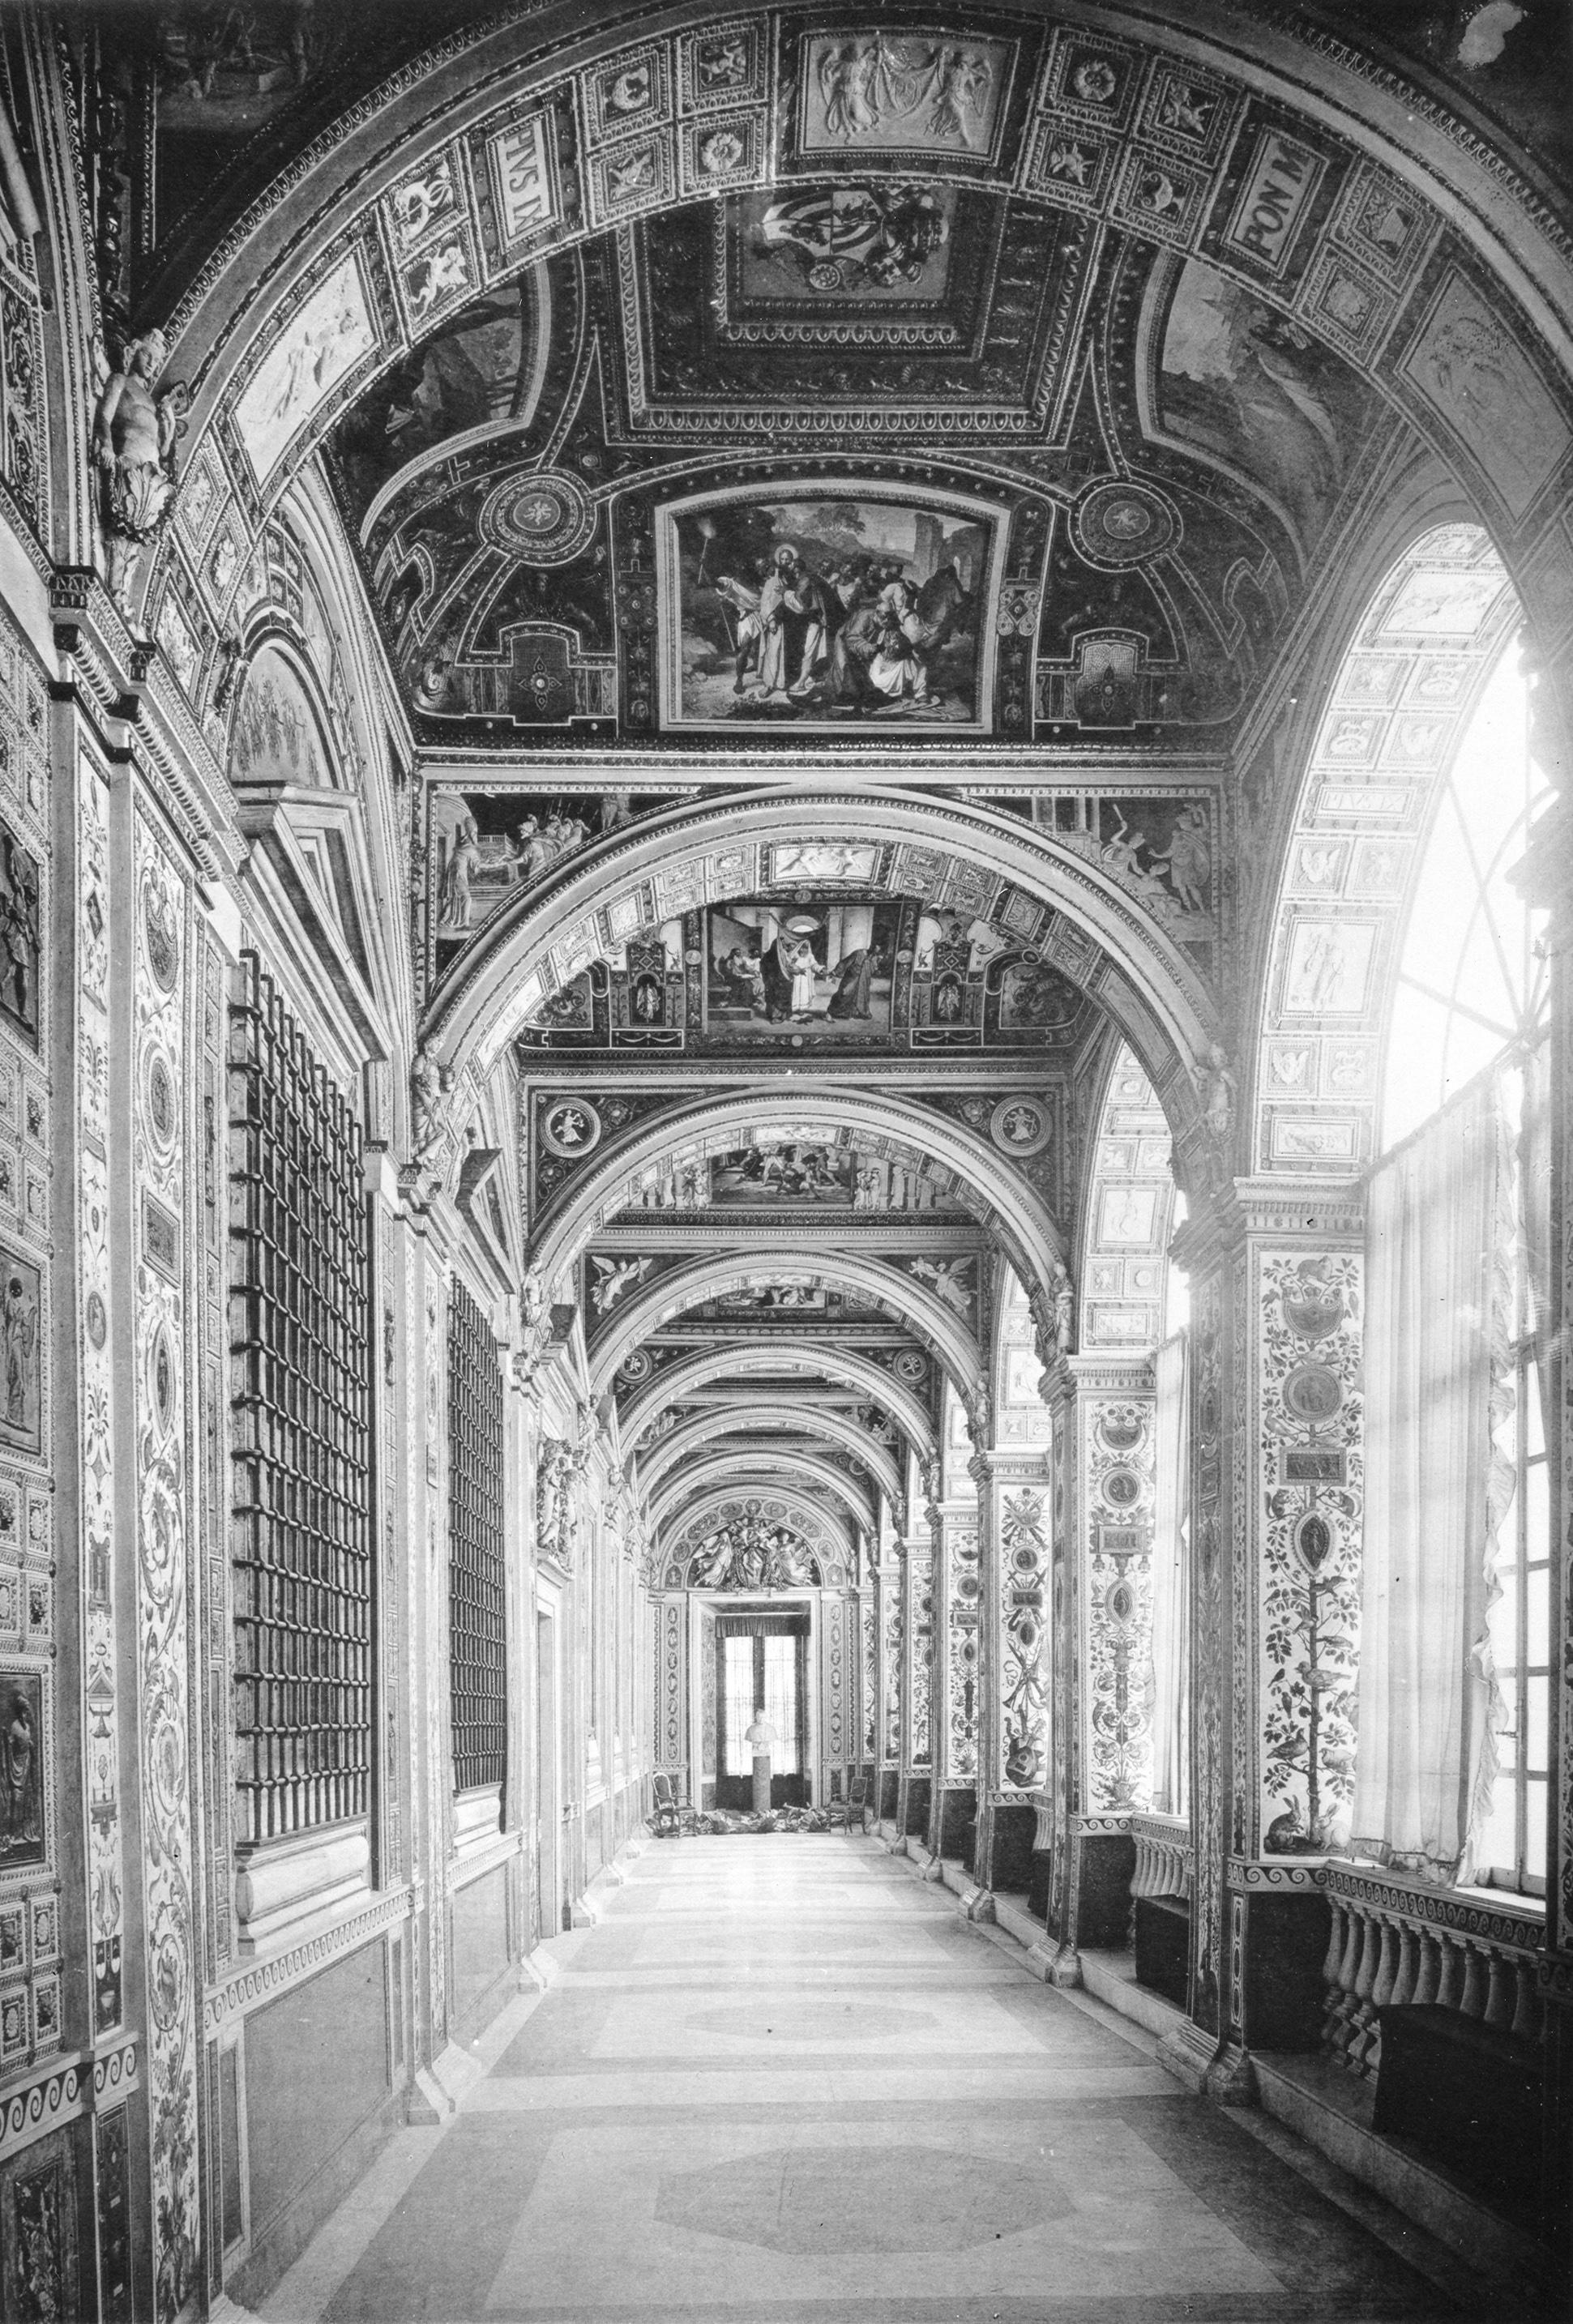 Raphael's Loggia in the Vatican.